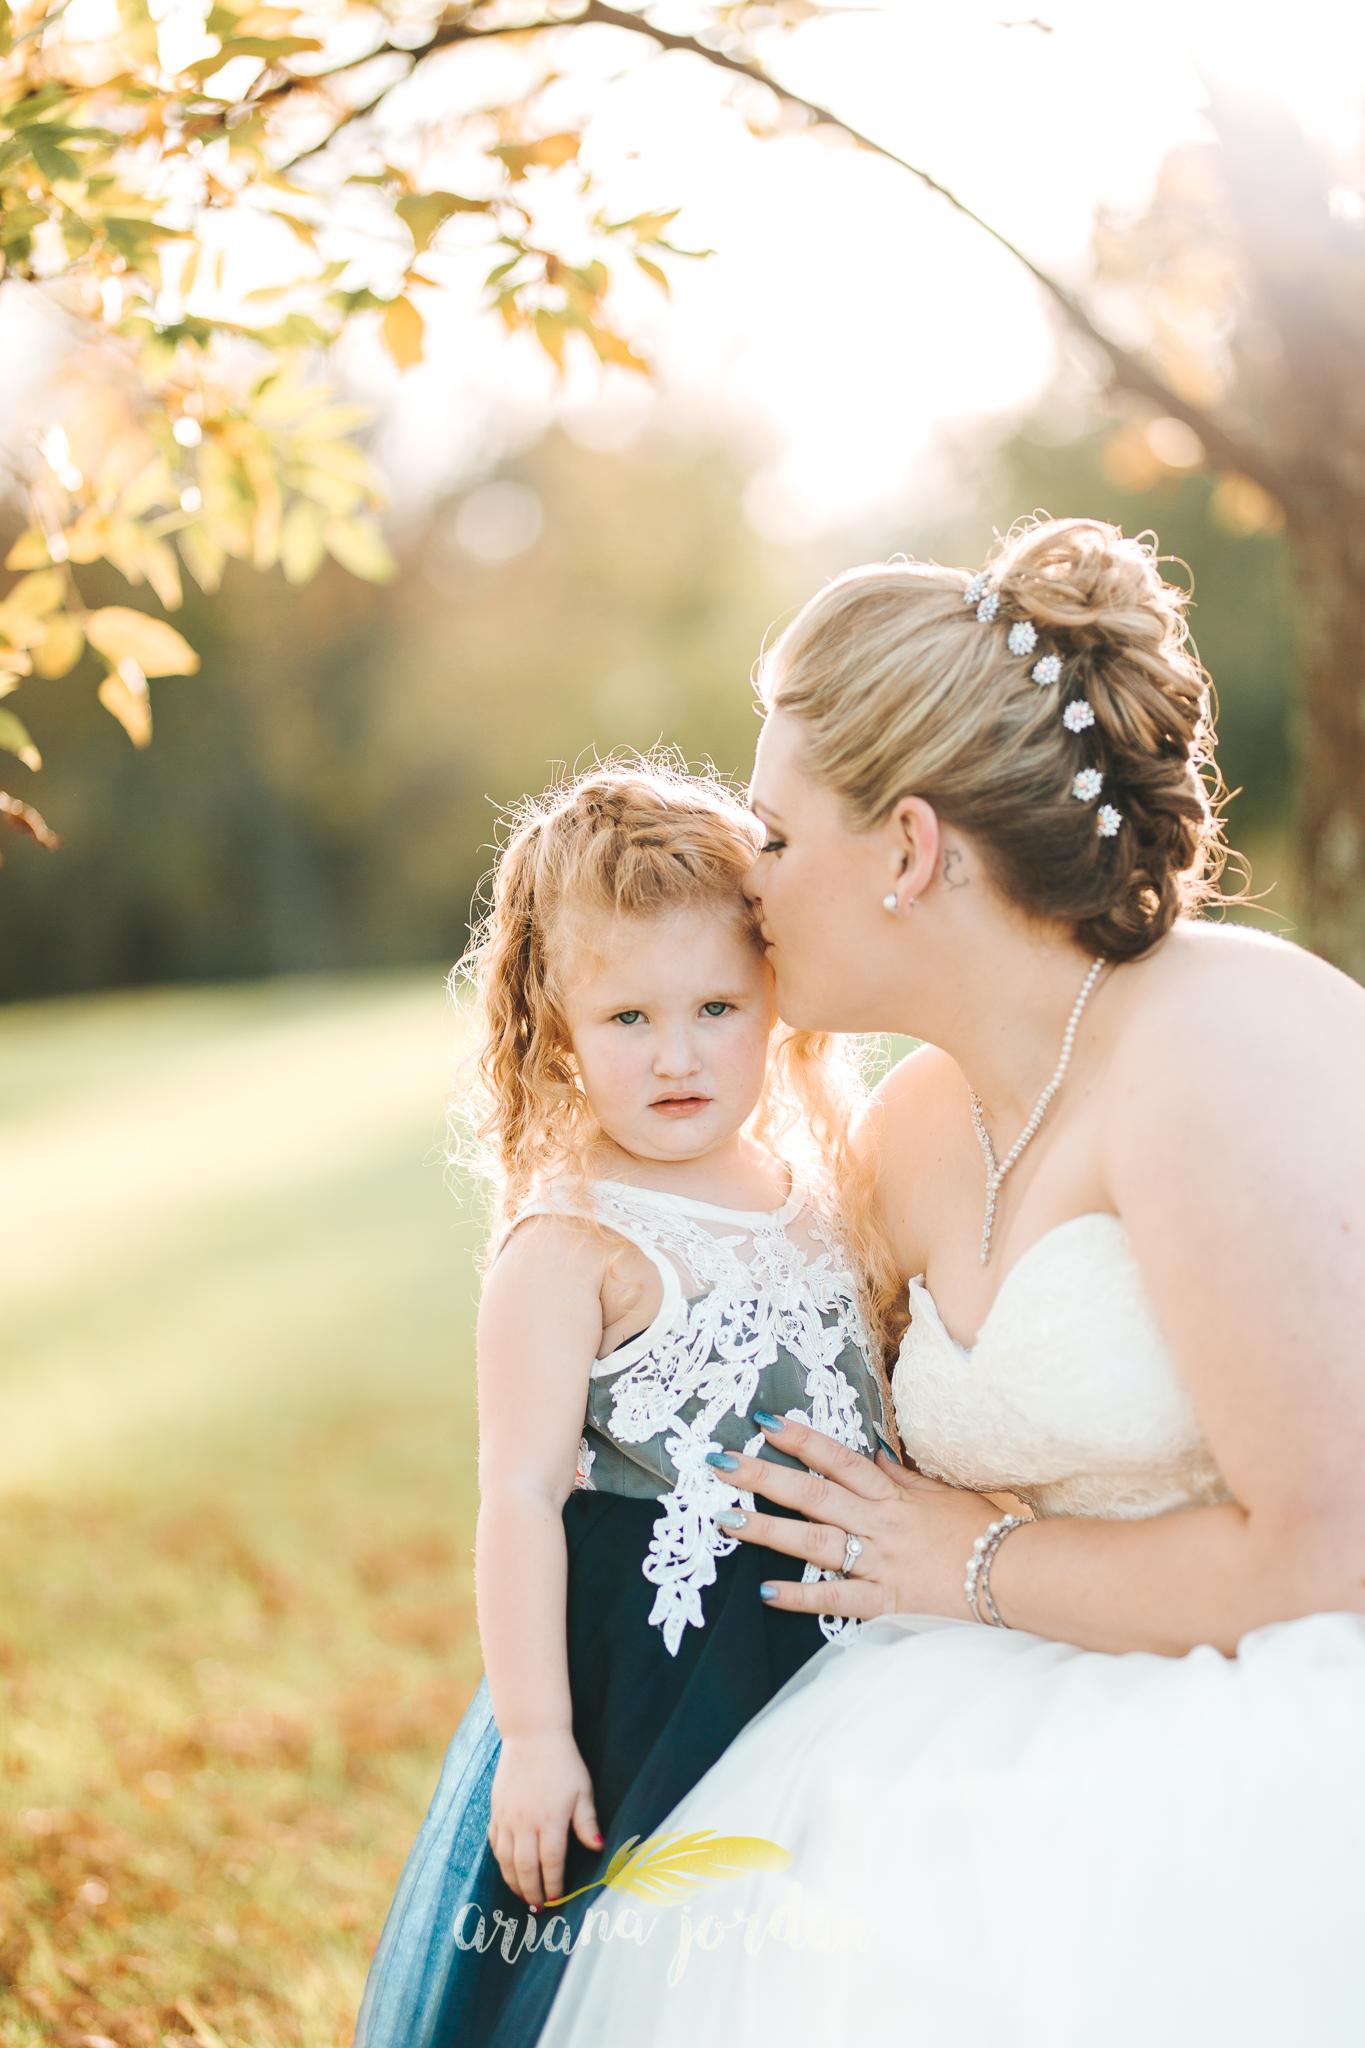 0062 Ariana Jordan Photography - Georgetown KY Wedding Photographer 6738.jpg